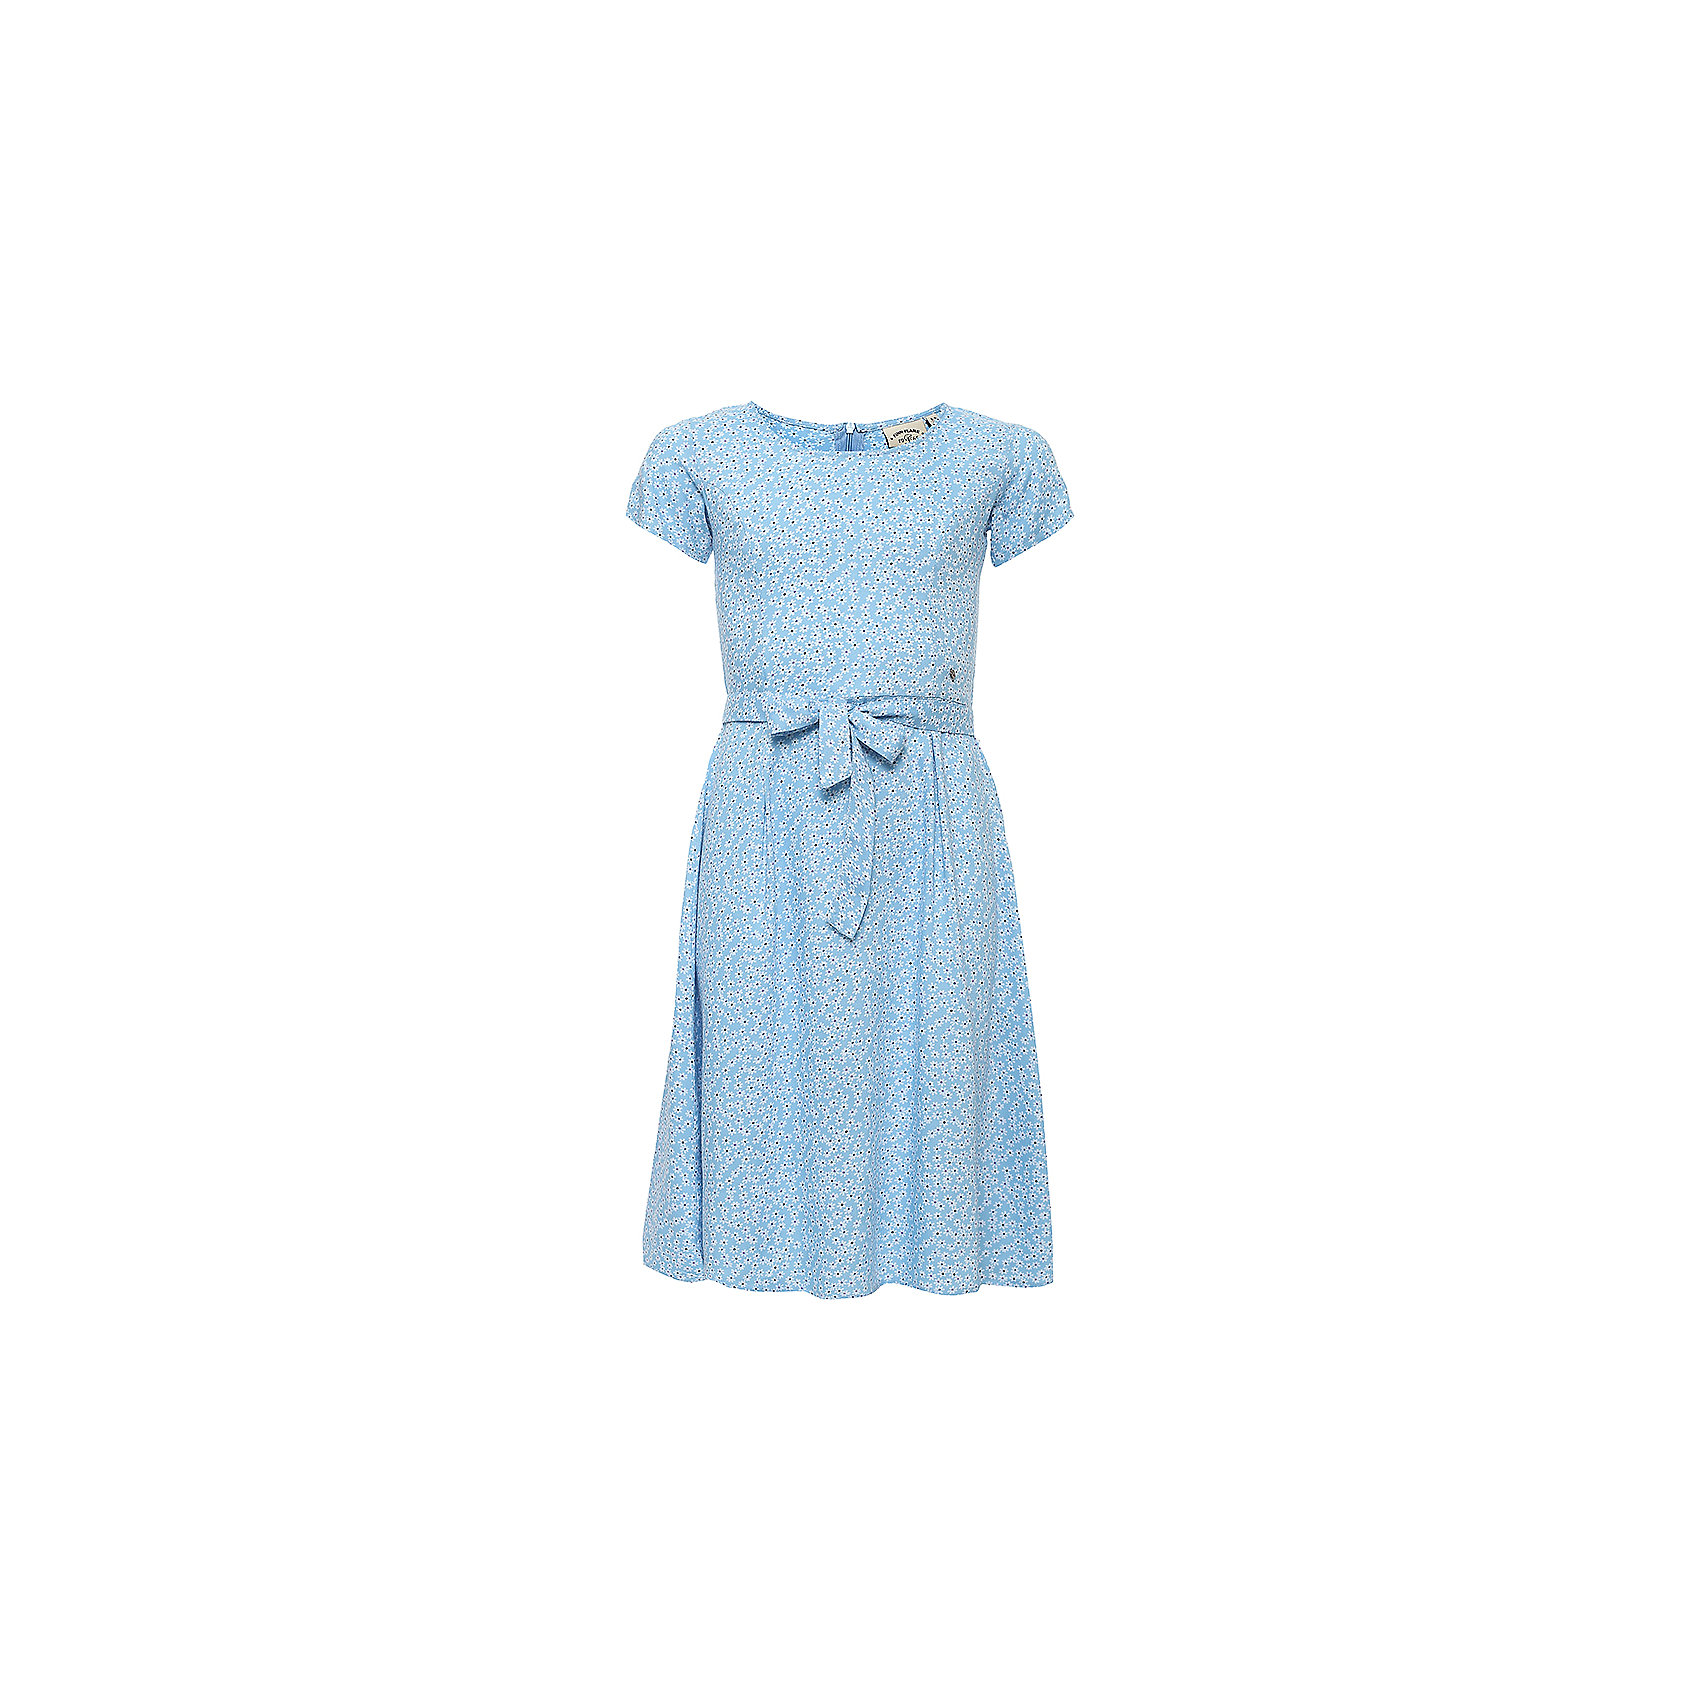 Платье для девочки Finn FlareПлатье для девочки от известного бренда Finn Flare<br>Фактура материала:Текстильный<br>Вид застежки:Молния<br> Длина рукава:Короткие<br> Тип карманов:Без карманов<br>Состав:<br>100% вискоза<br><br>Ширина мм: 236<br>Глубина мм: 16<br>Высота мм: 184<br>Вес г: 177<br>Цвет: голубой<br>Возраст от месяцев: 48<br>Возраст до месяцев: 60<br>Пол: Женский<br>Возраст: Детский<br>Размер: 110,122,134,146,158<br>SKU: 4835241